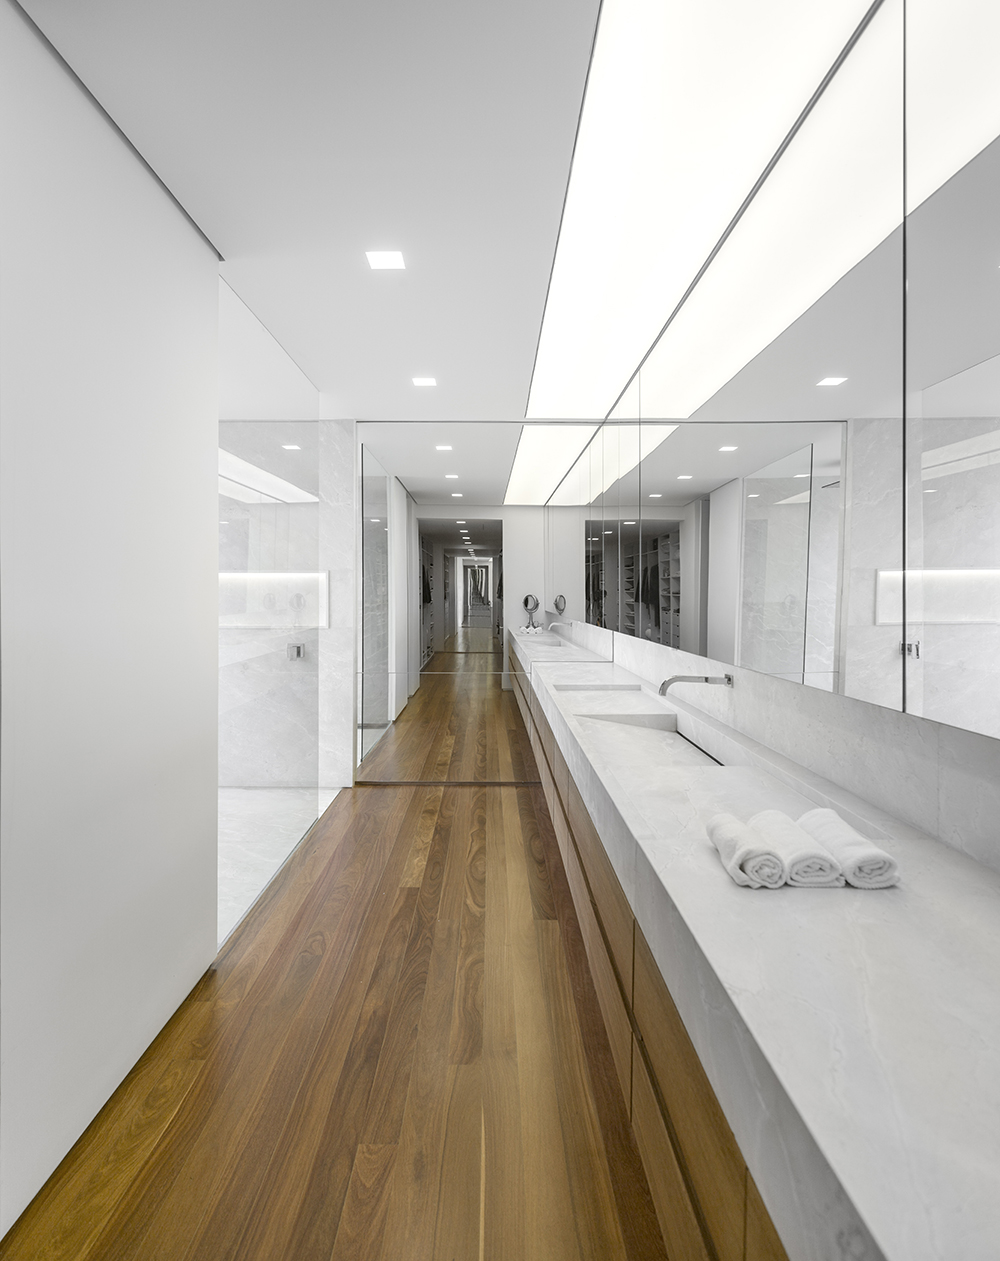 Alex-Lerner-House-Arthur-Casas-Rio-De-Janeiro-9.jpg